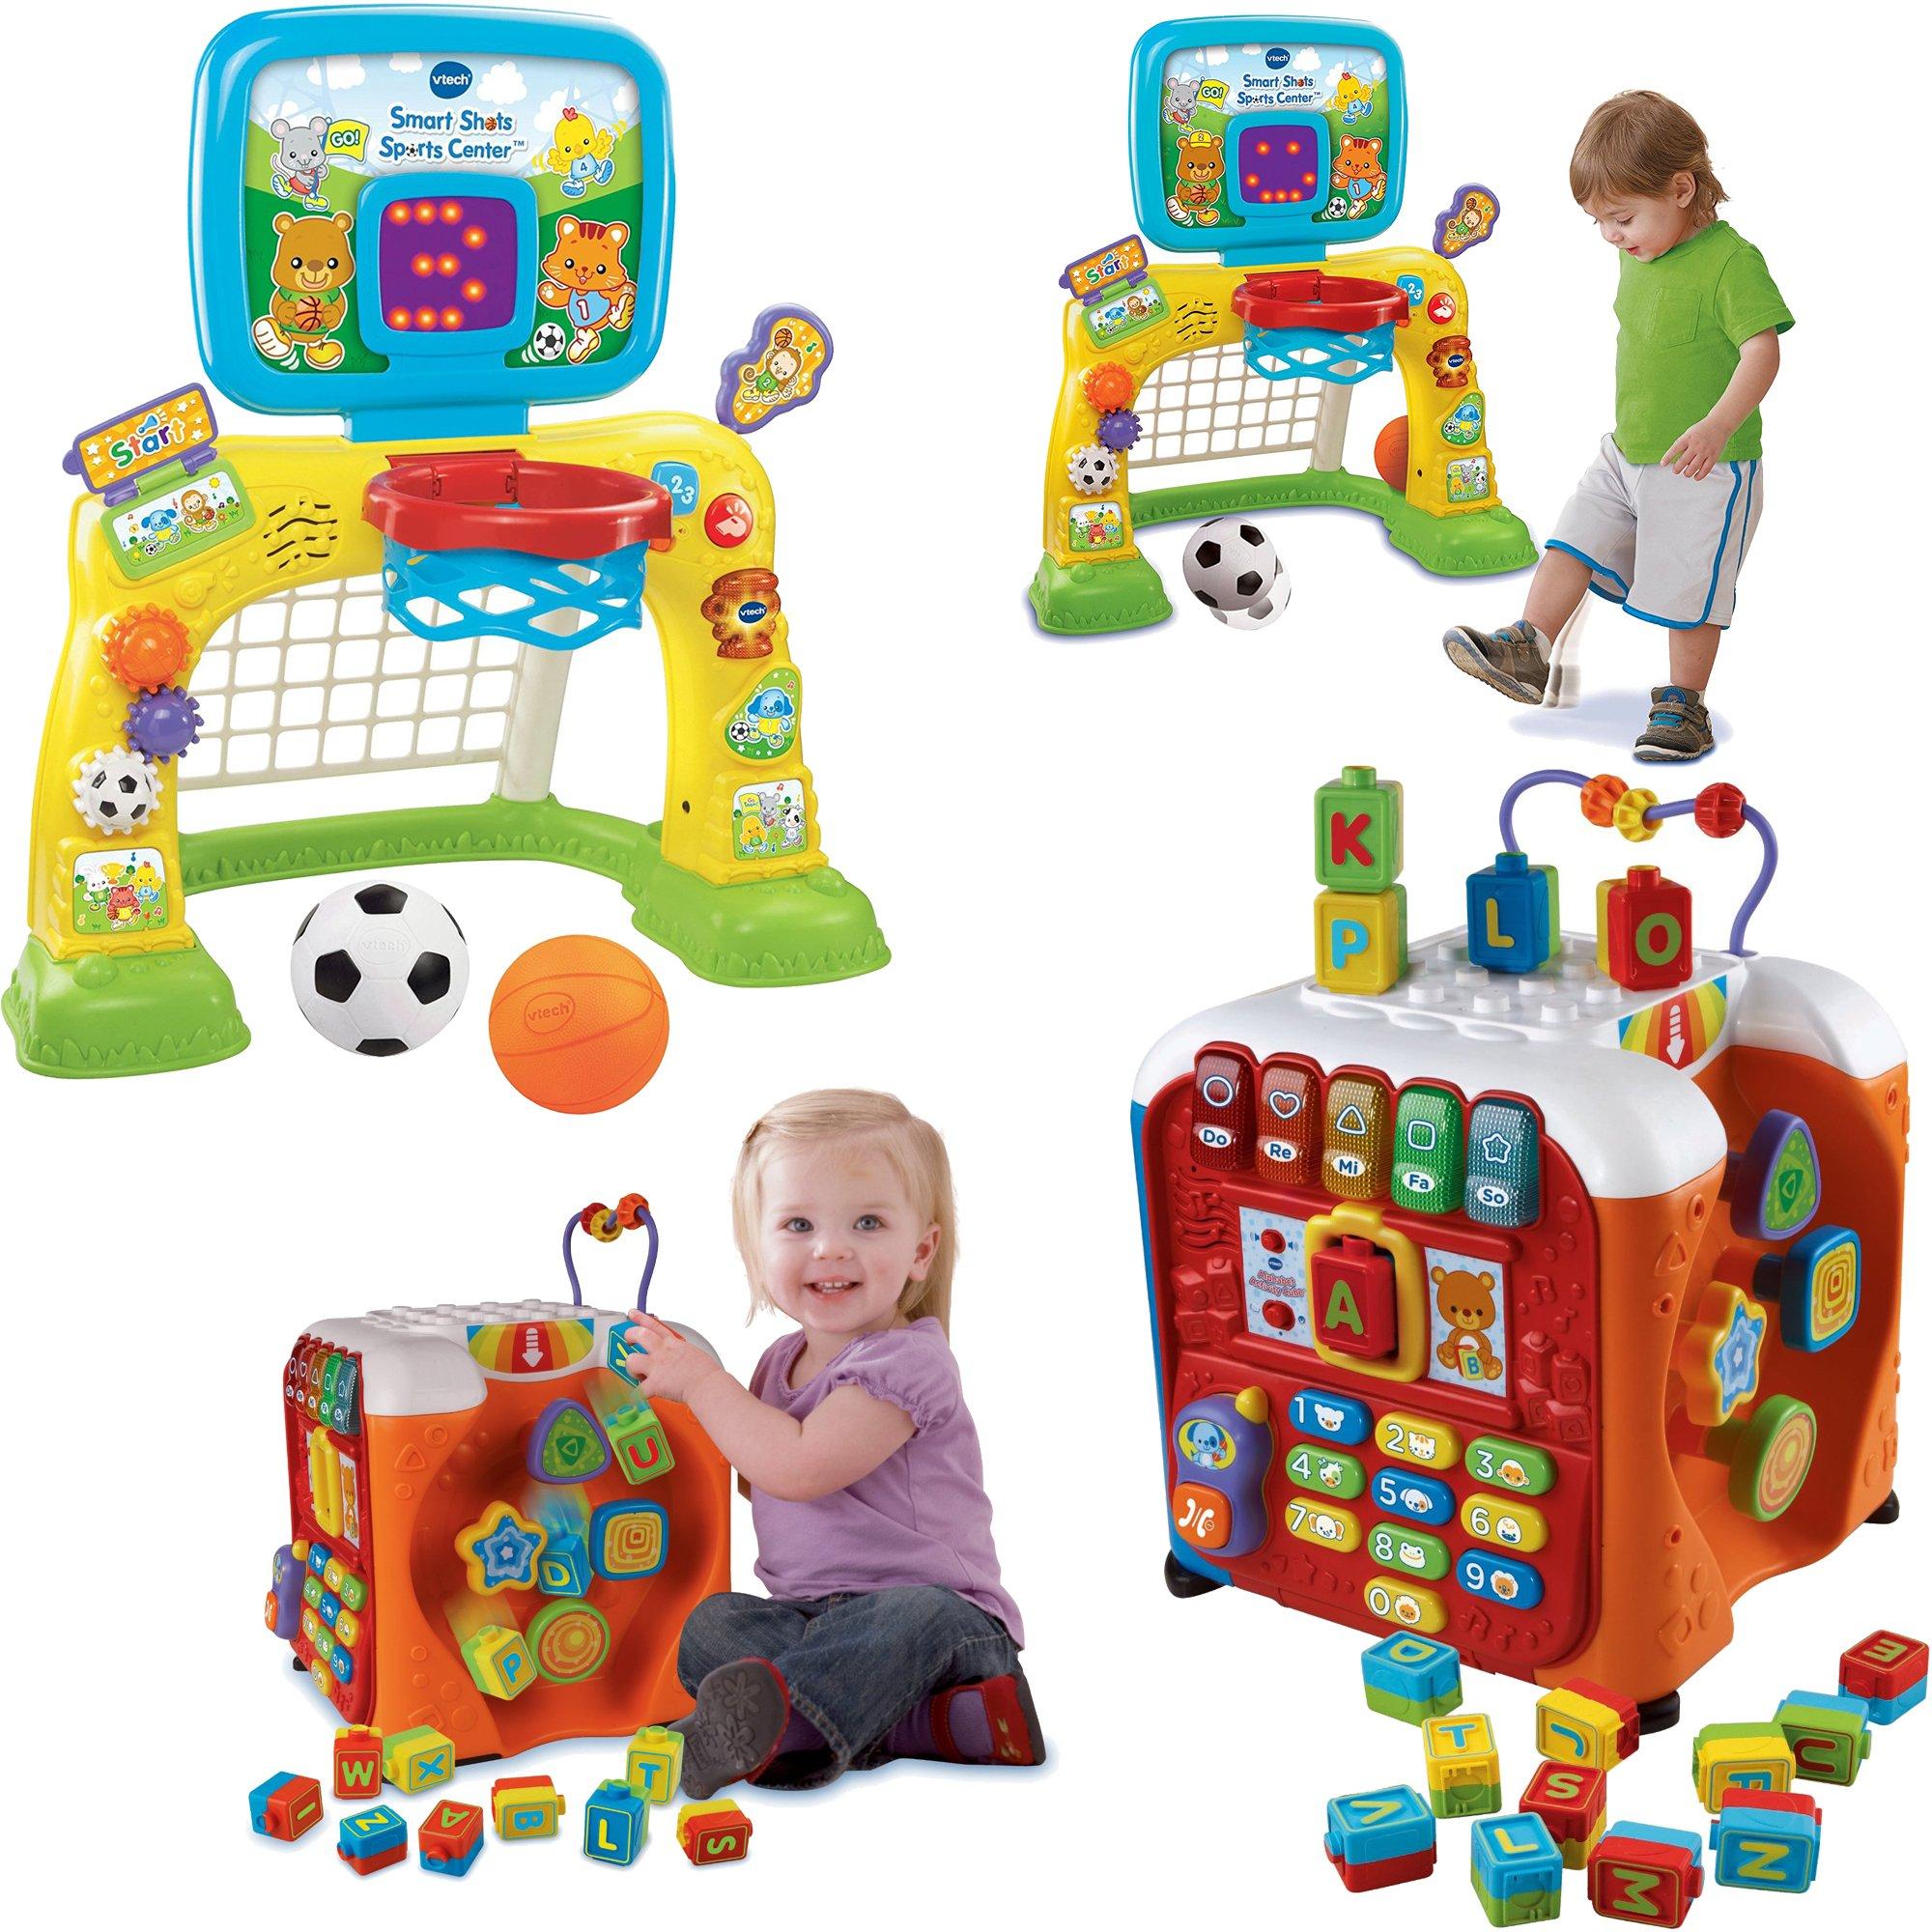 VTech Smart Shots Sports Center and Alphabet Activity Cube - Kids Brain Development Toys, 2-Piece Bundle